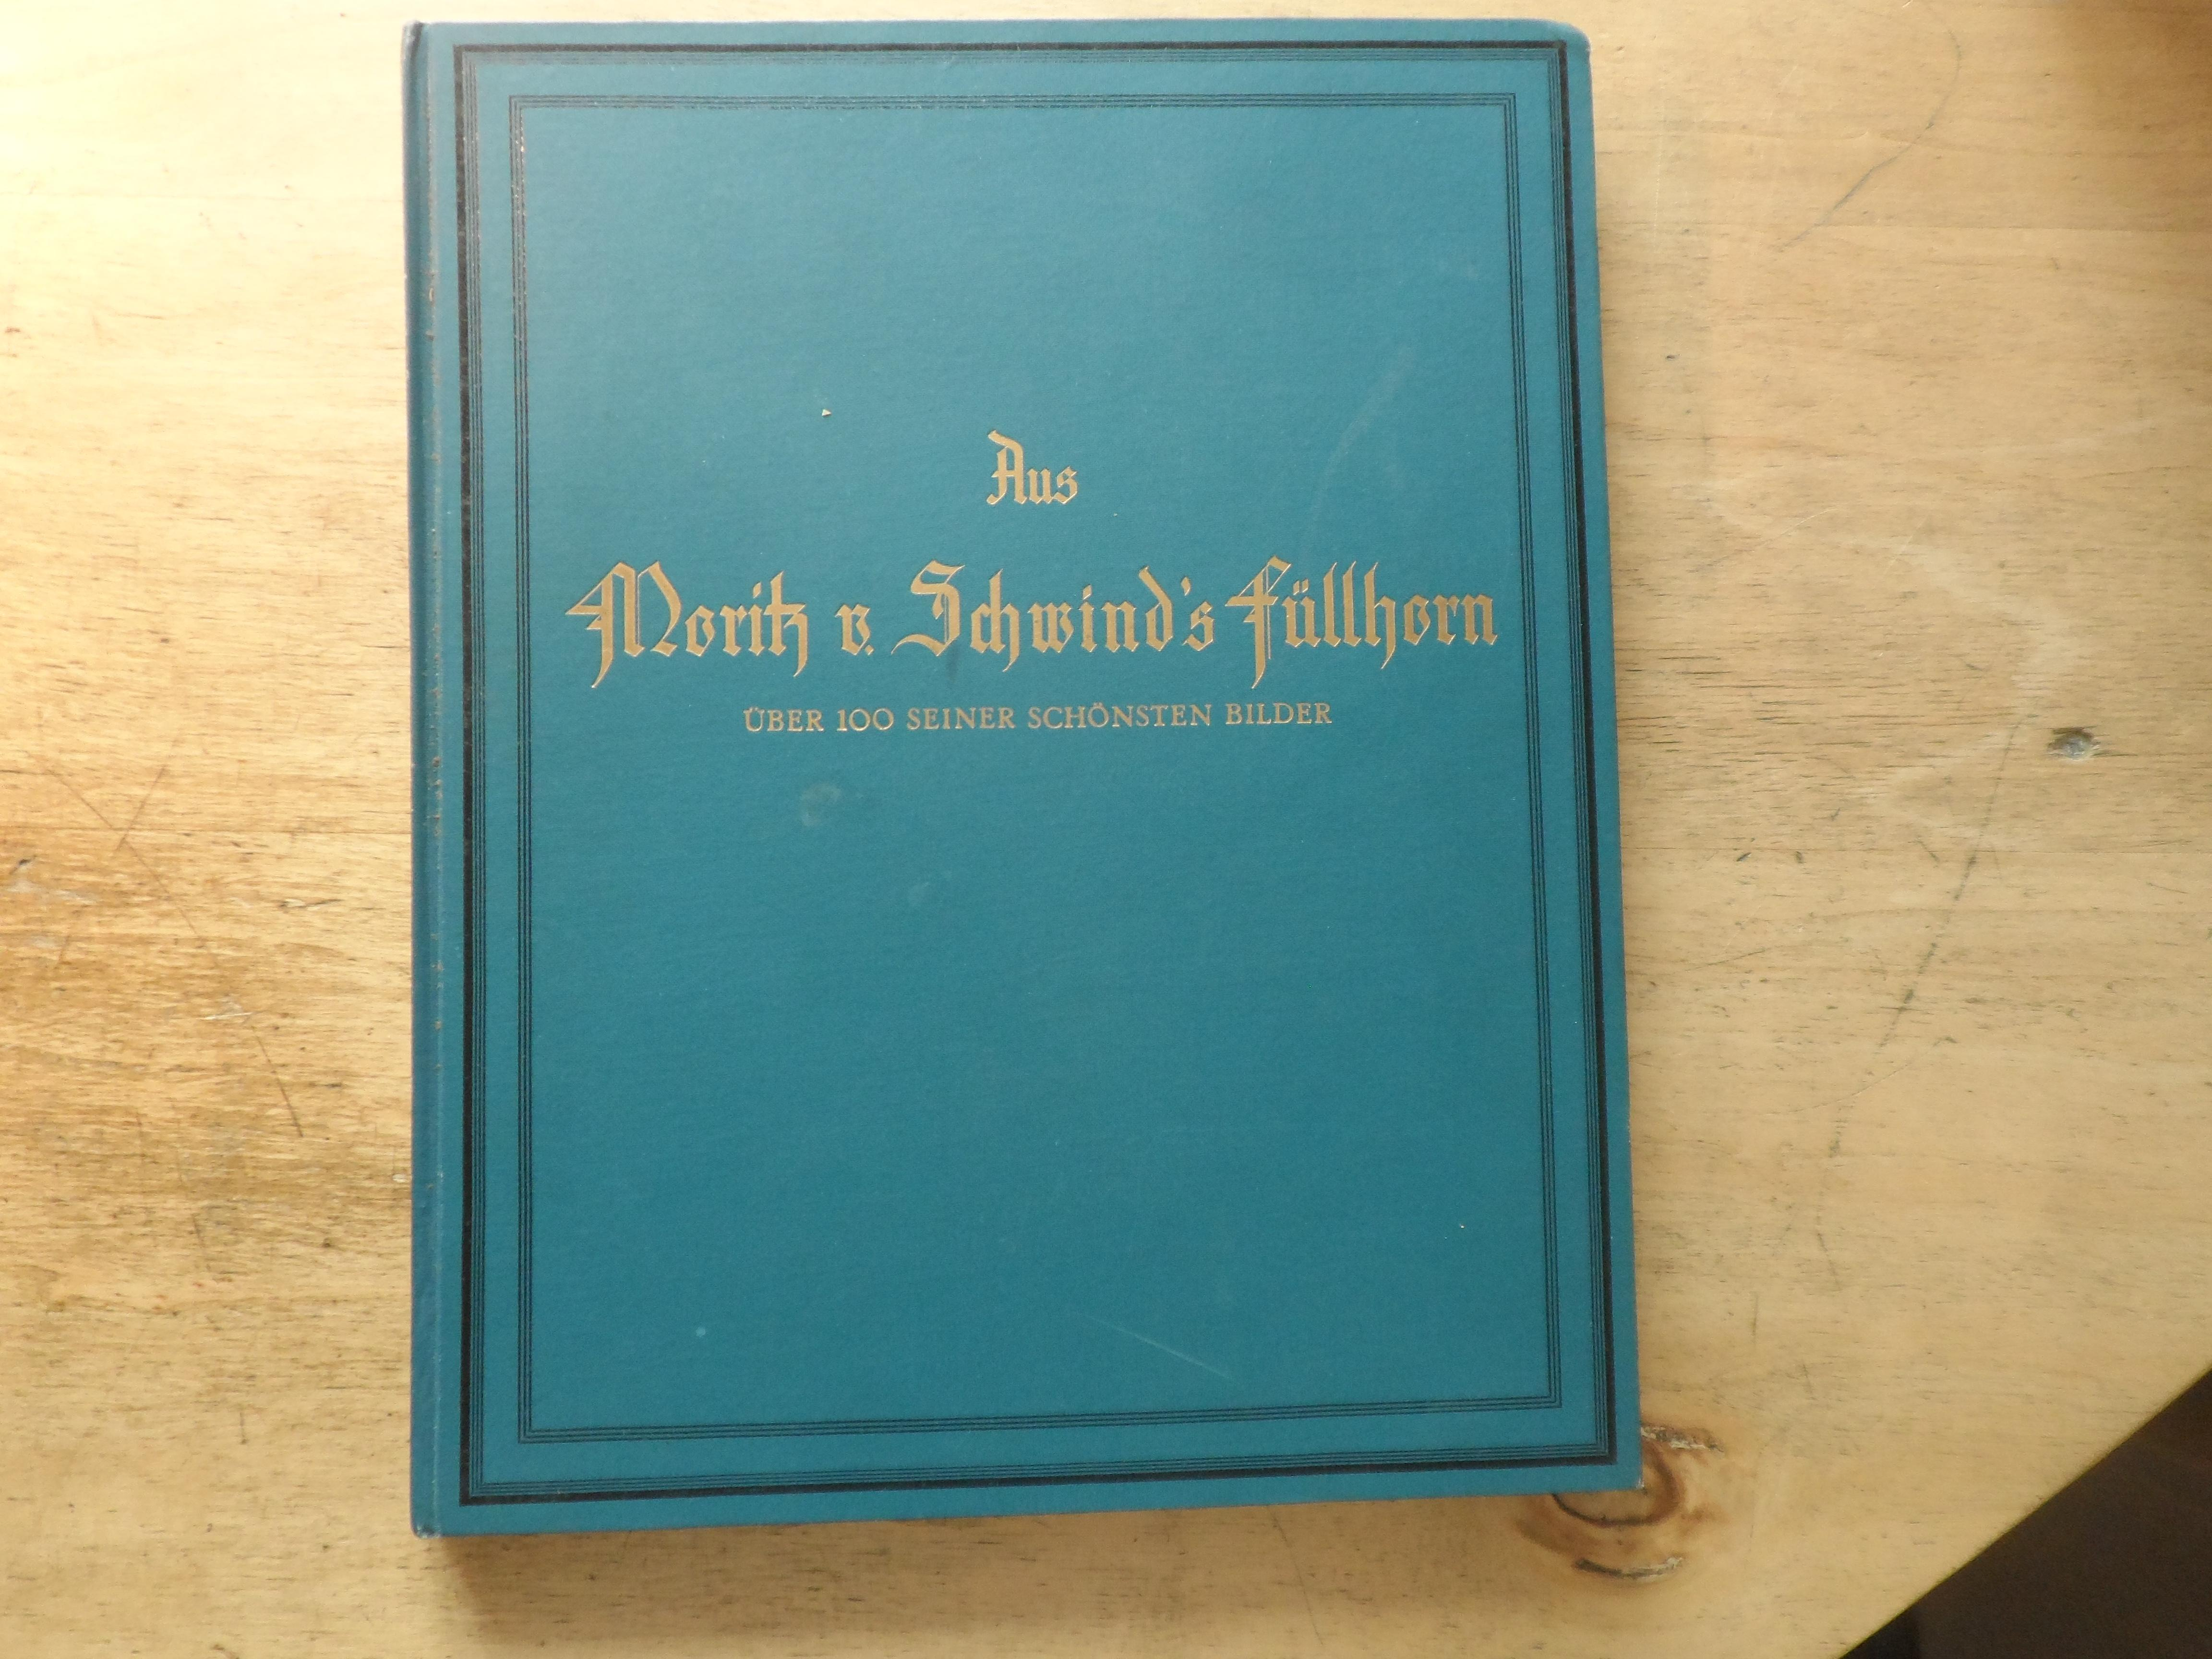 Aus Moritz v. Schwind's Füllhorn - über: Ostini,Fritz v.